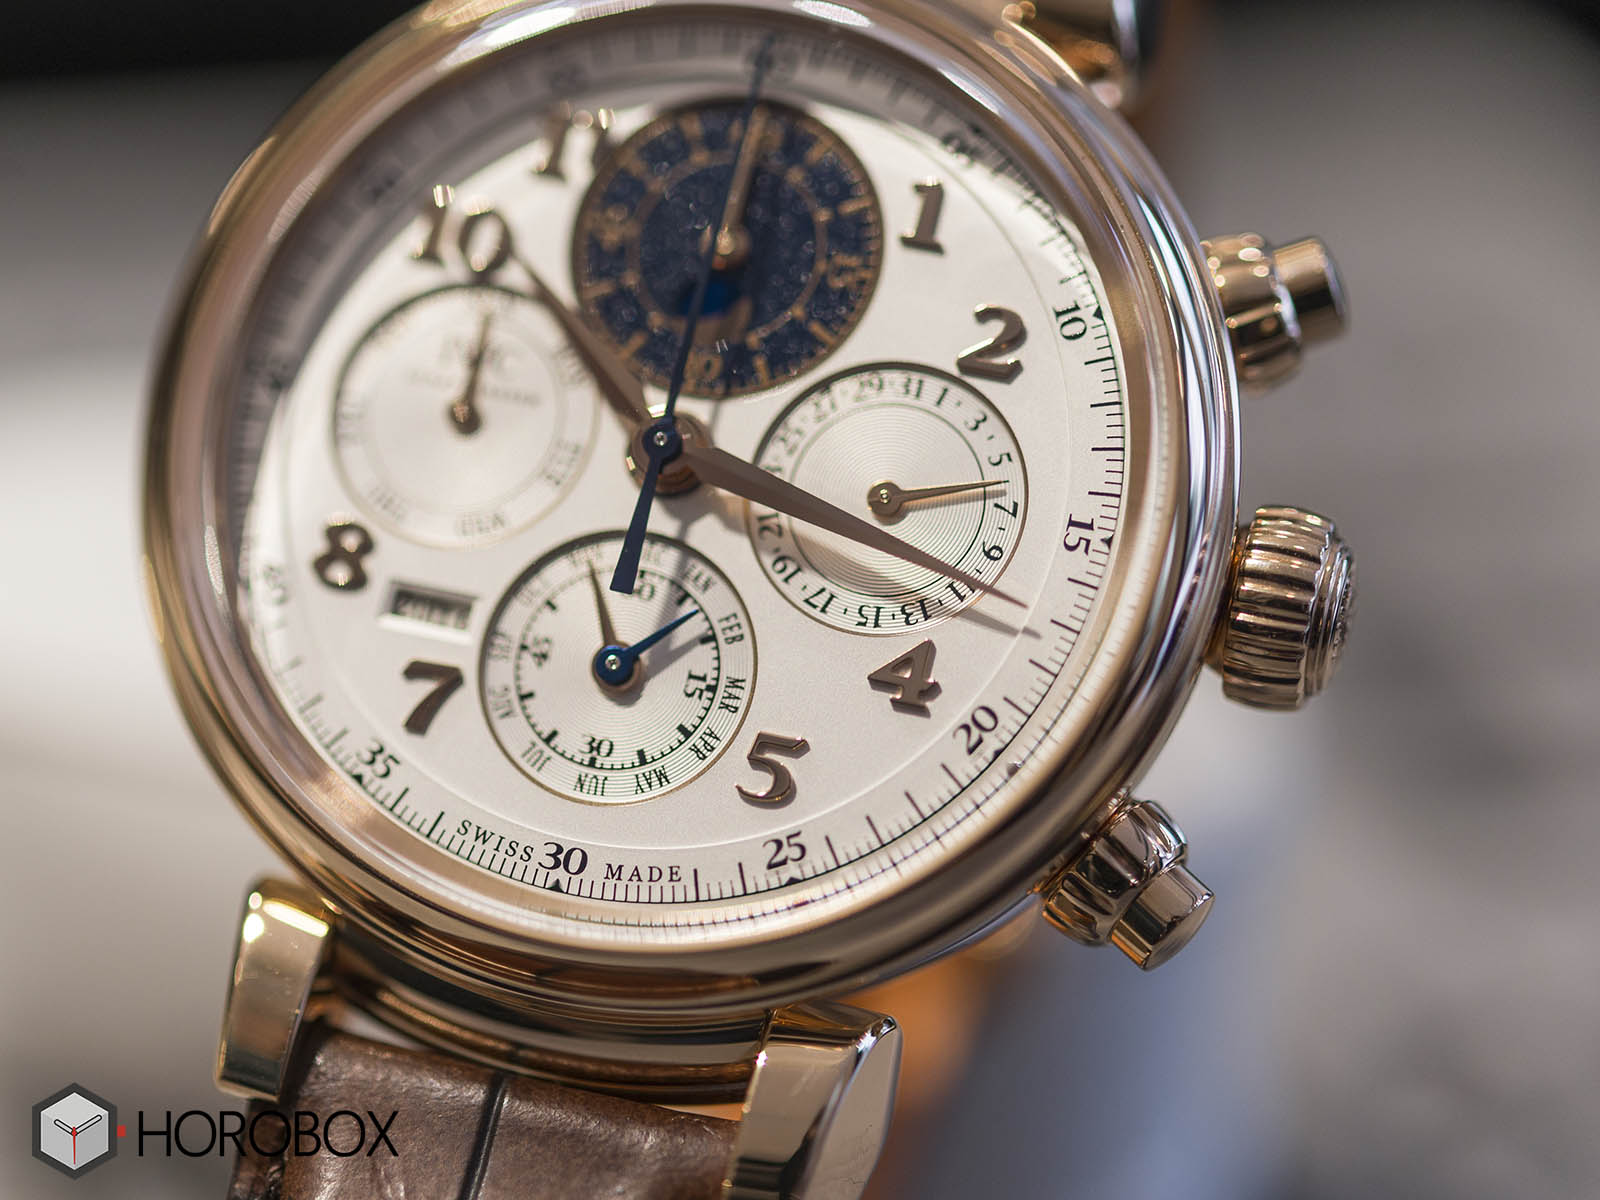 Perpetual Calendar Chronograph : Iw iwc da vinci perpetual calendar chronograph